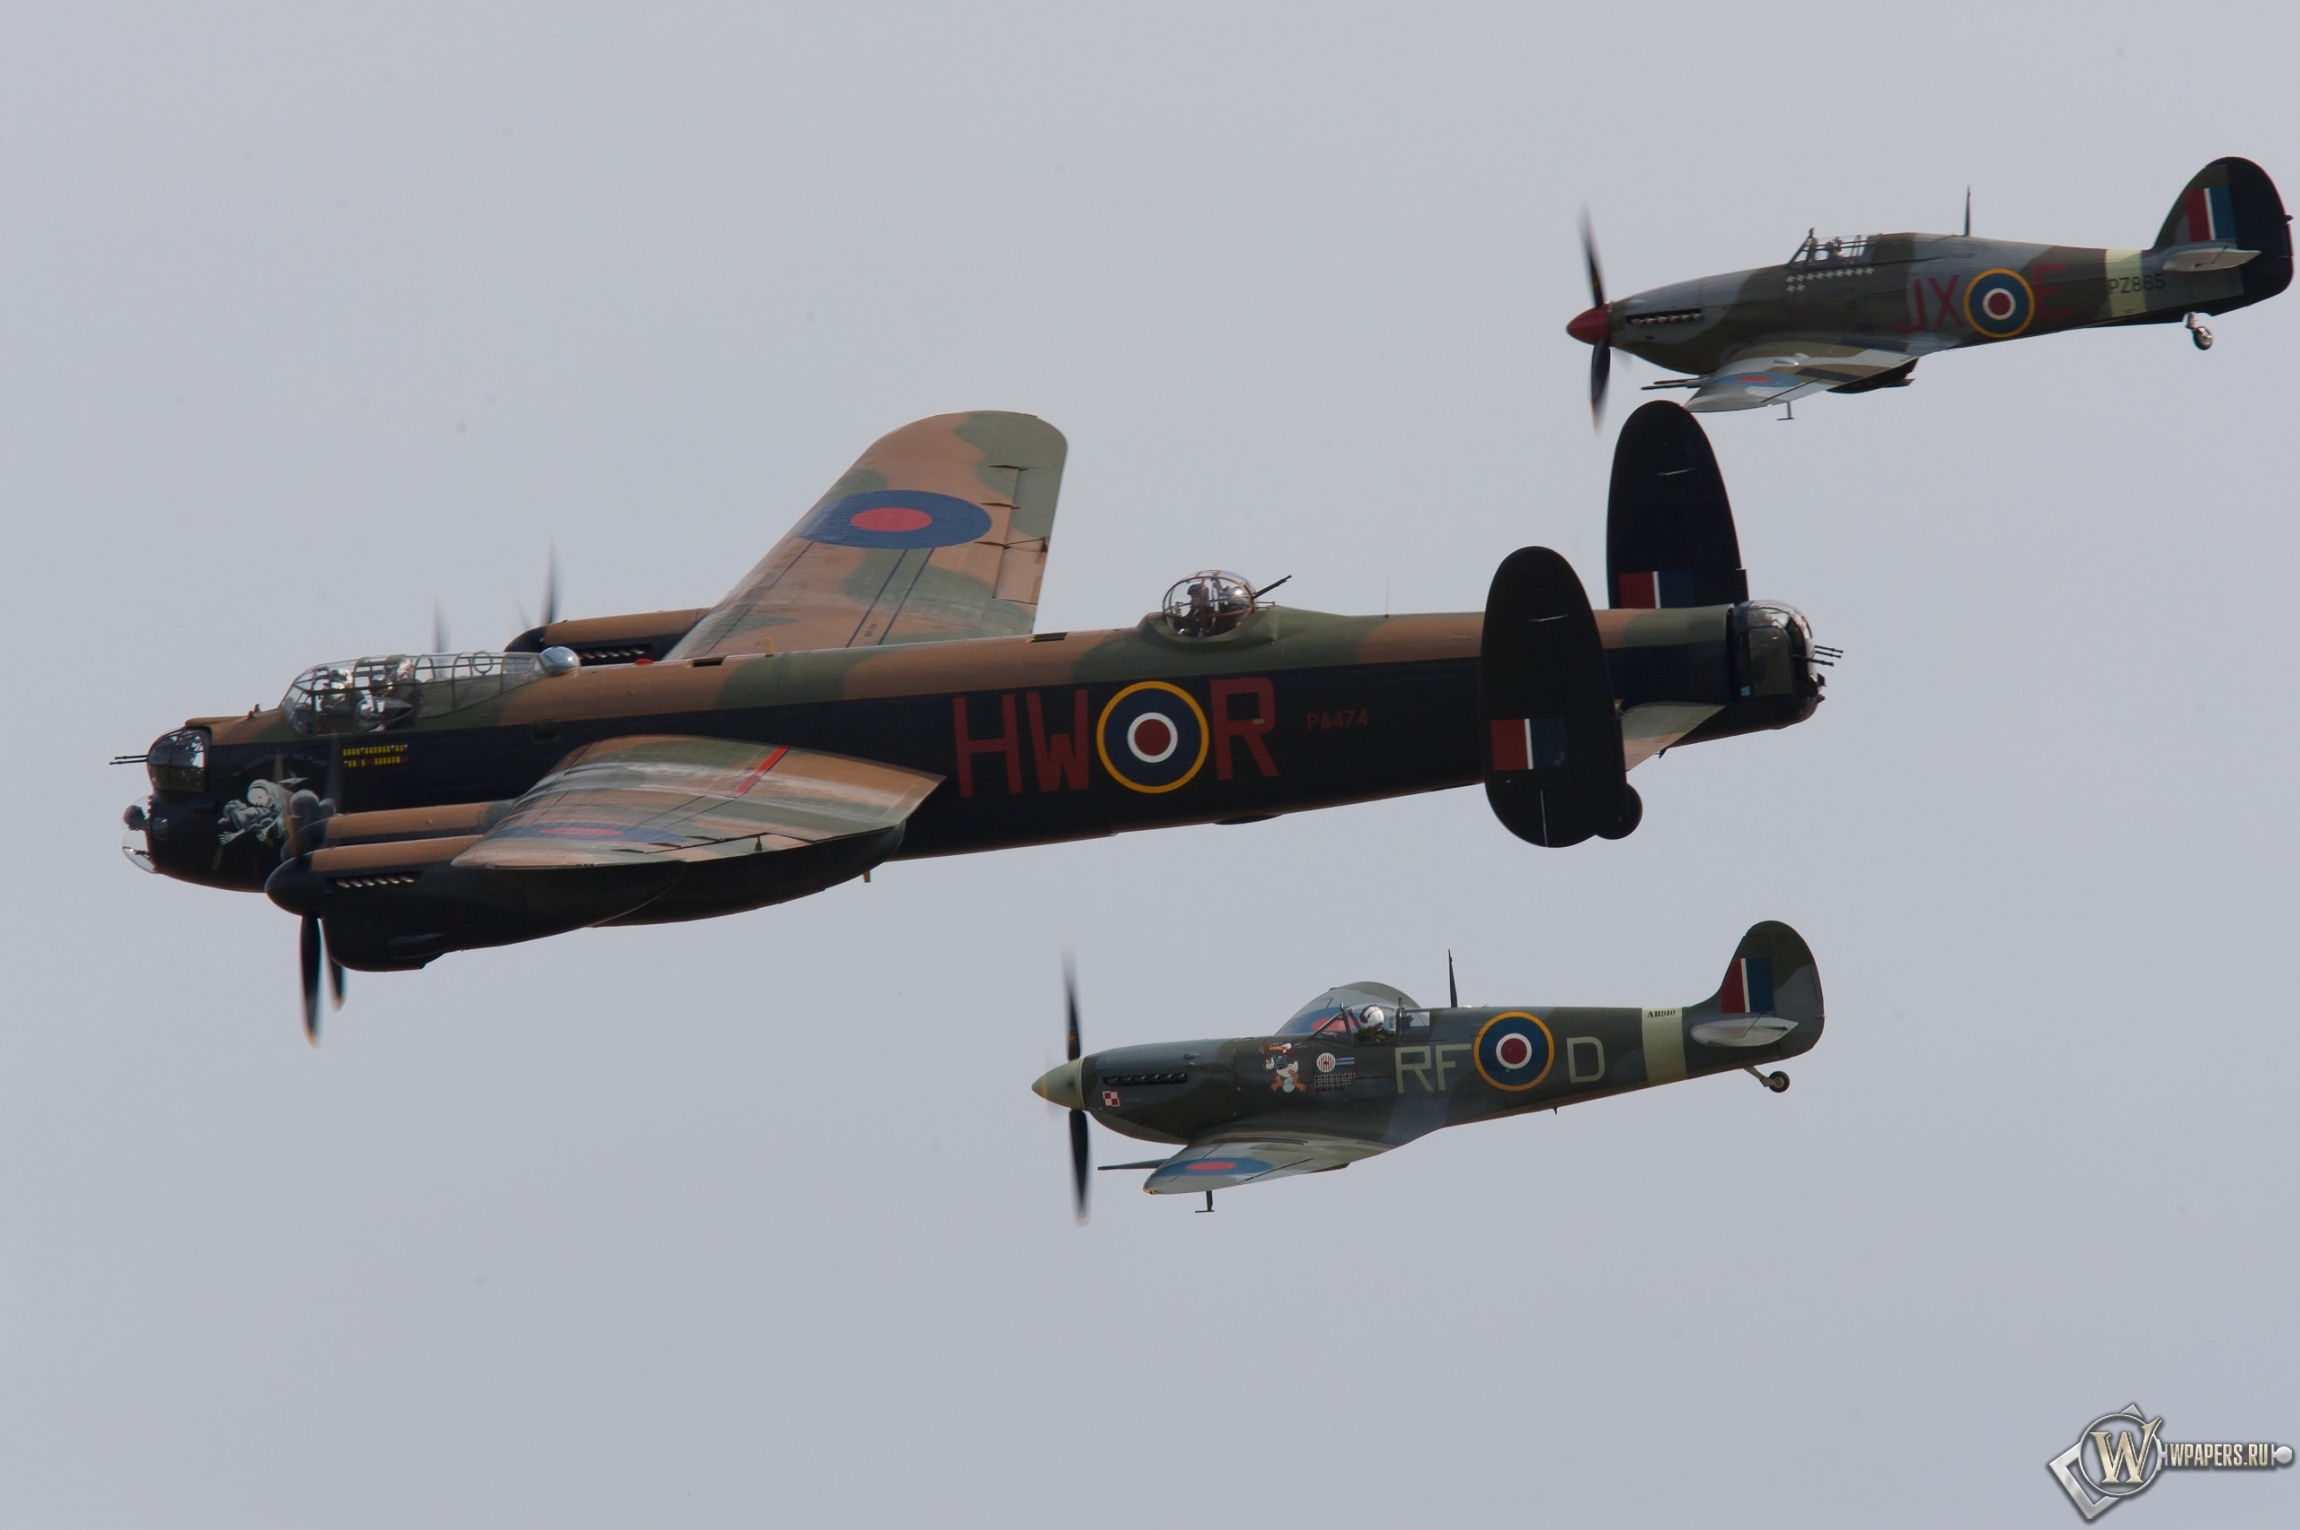 Avro-Lancaster 2300x1530